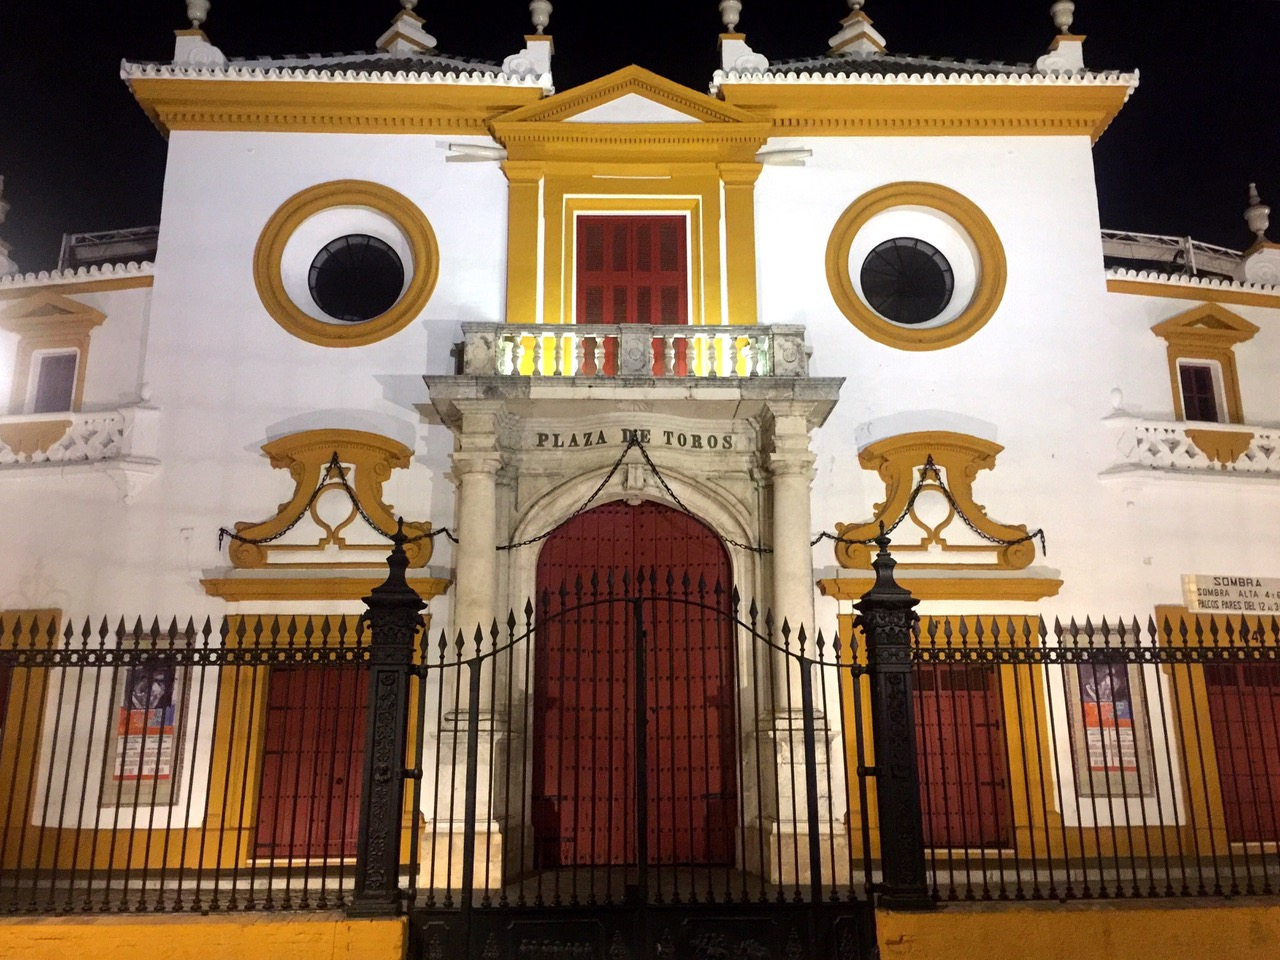 Plaza de Toros Sevilla, Spain